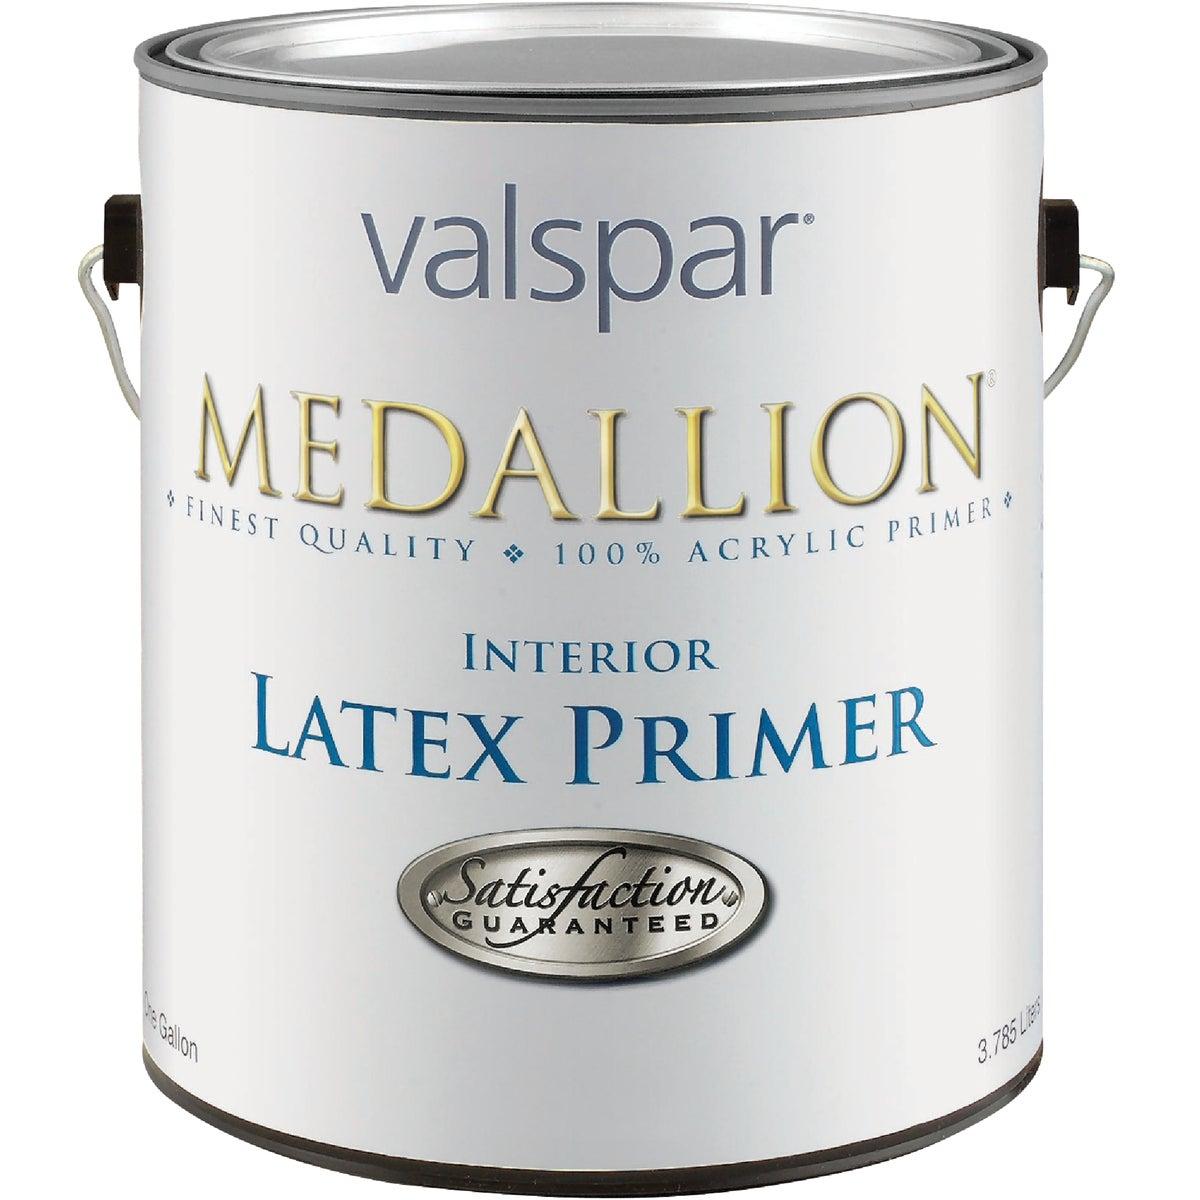 WHITE INT LATEX PRIMER - 027.0000190.007 by Valspar Corp